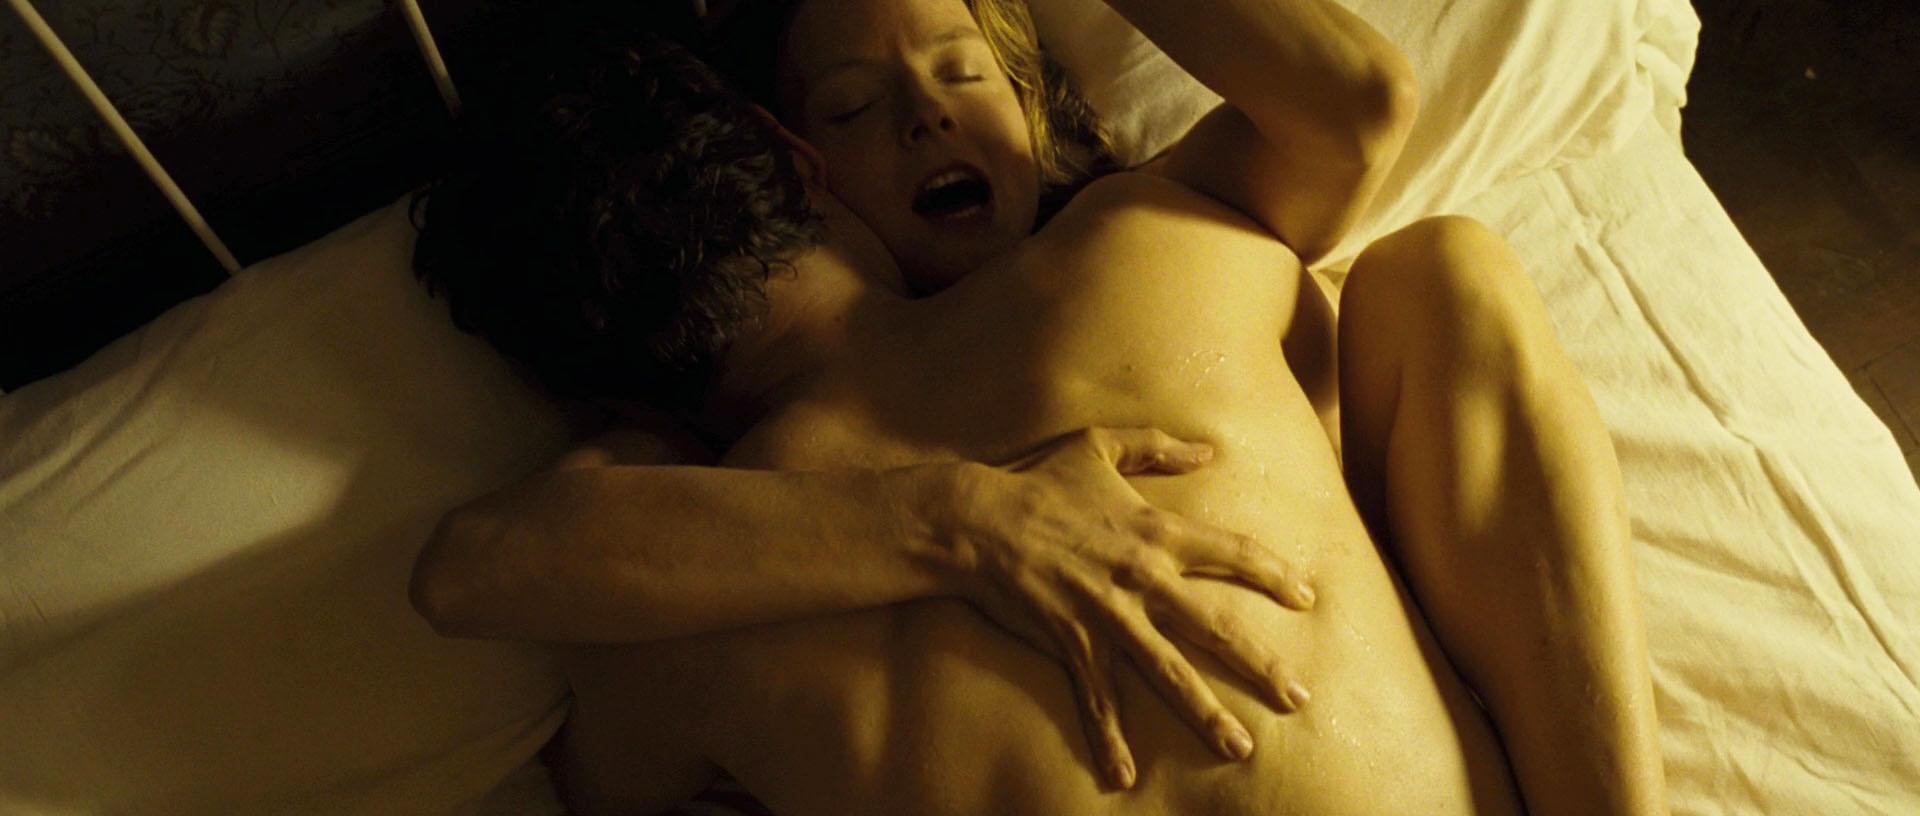 Porn Lesbian Movie Jodie Foster - Watch Online - Jodie Foster – A Very Long Engagement (2004) HD 1080p